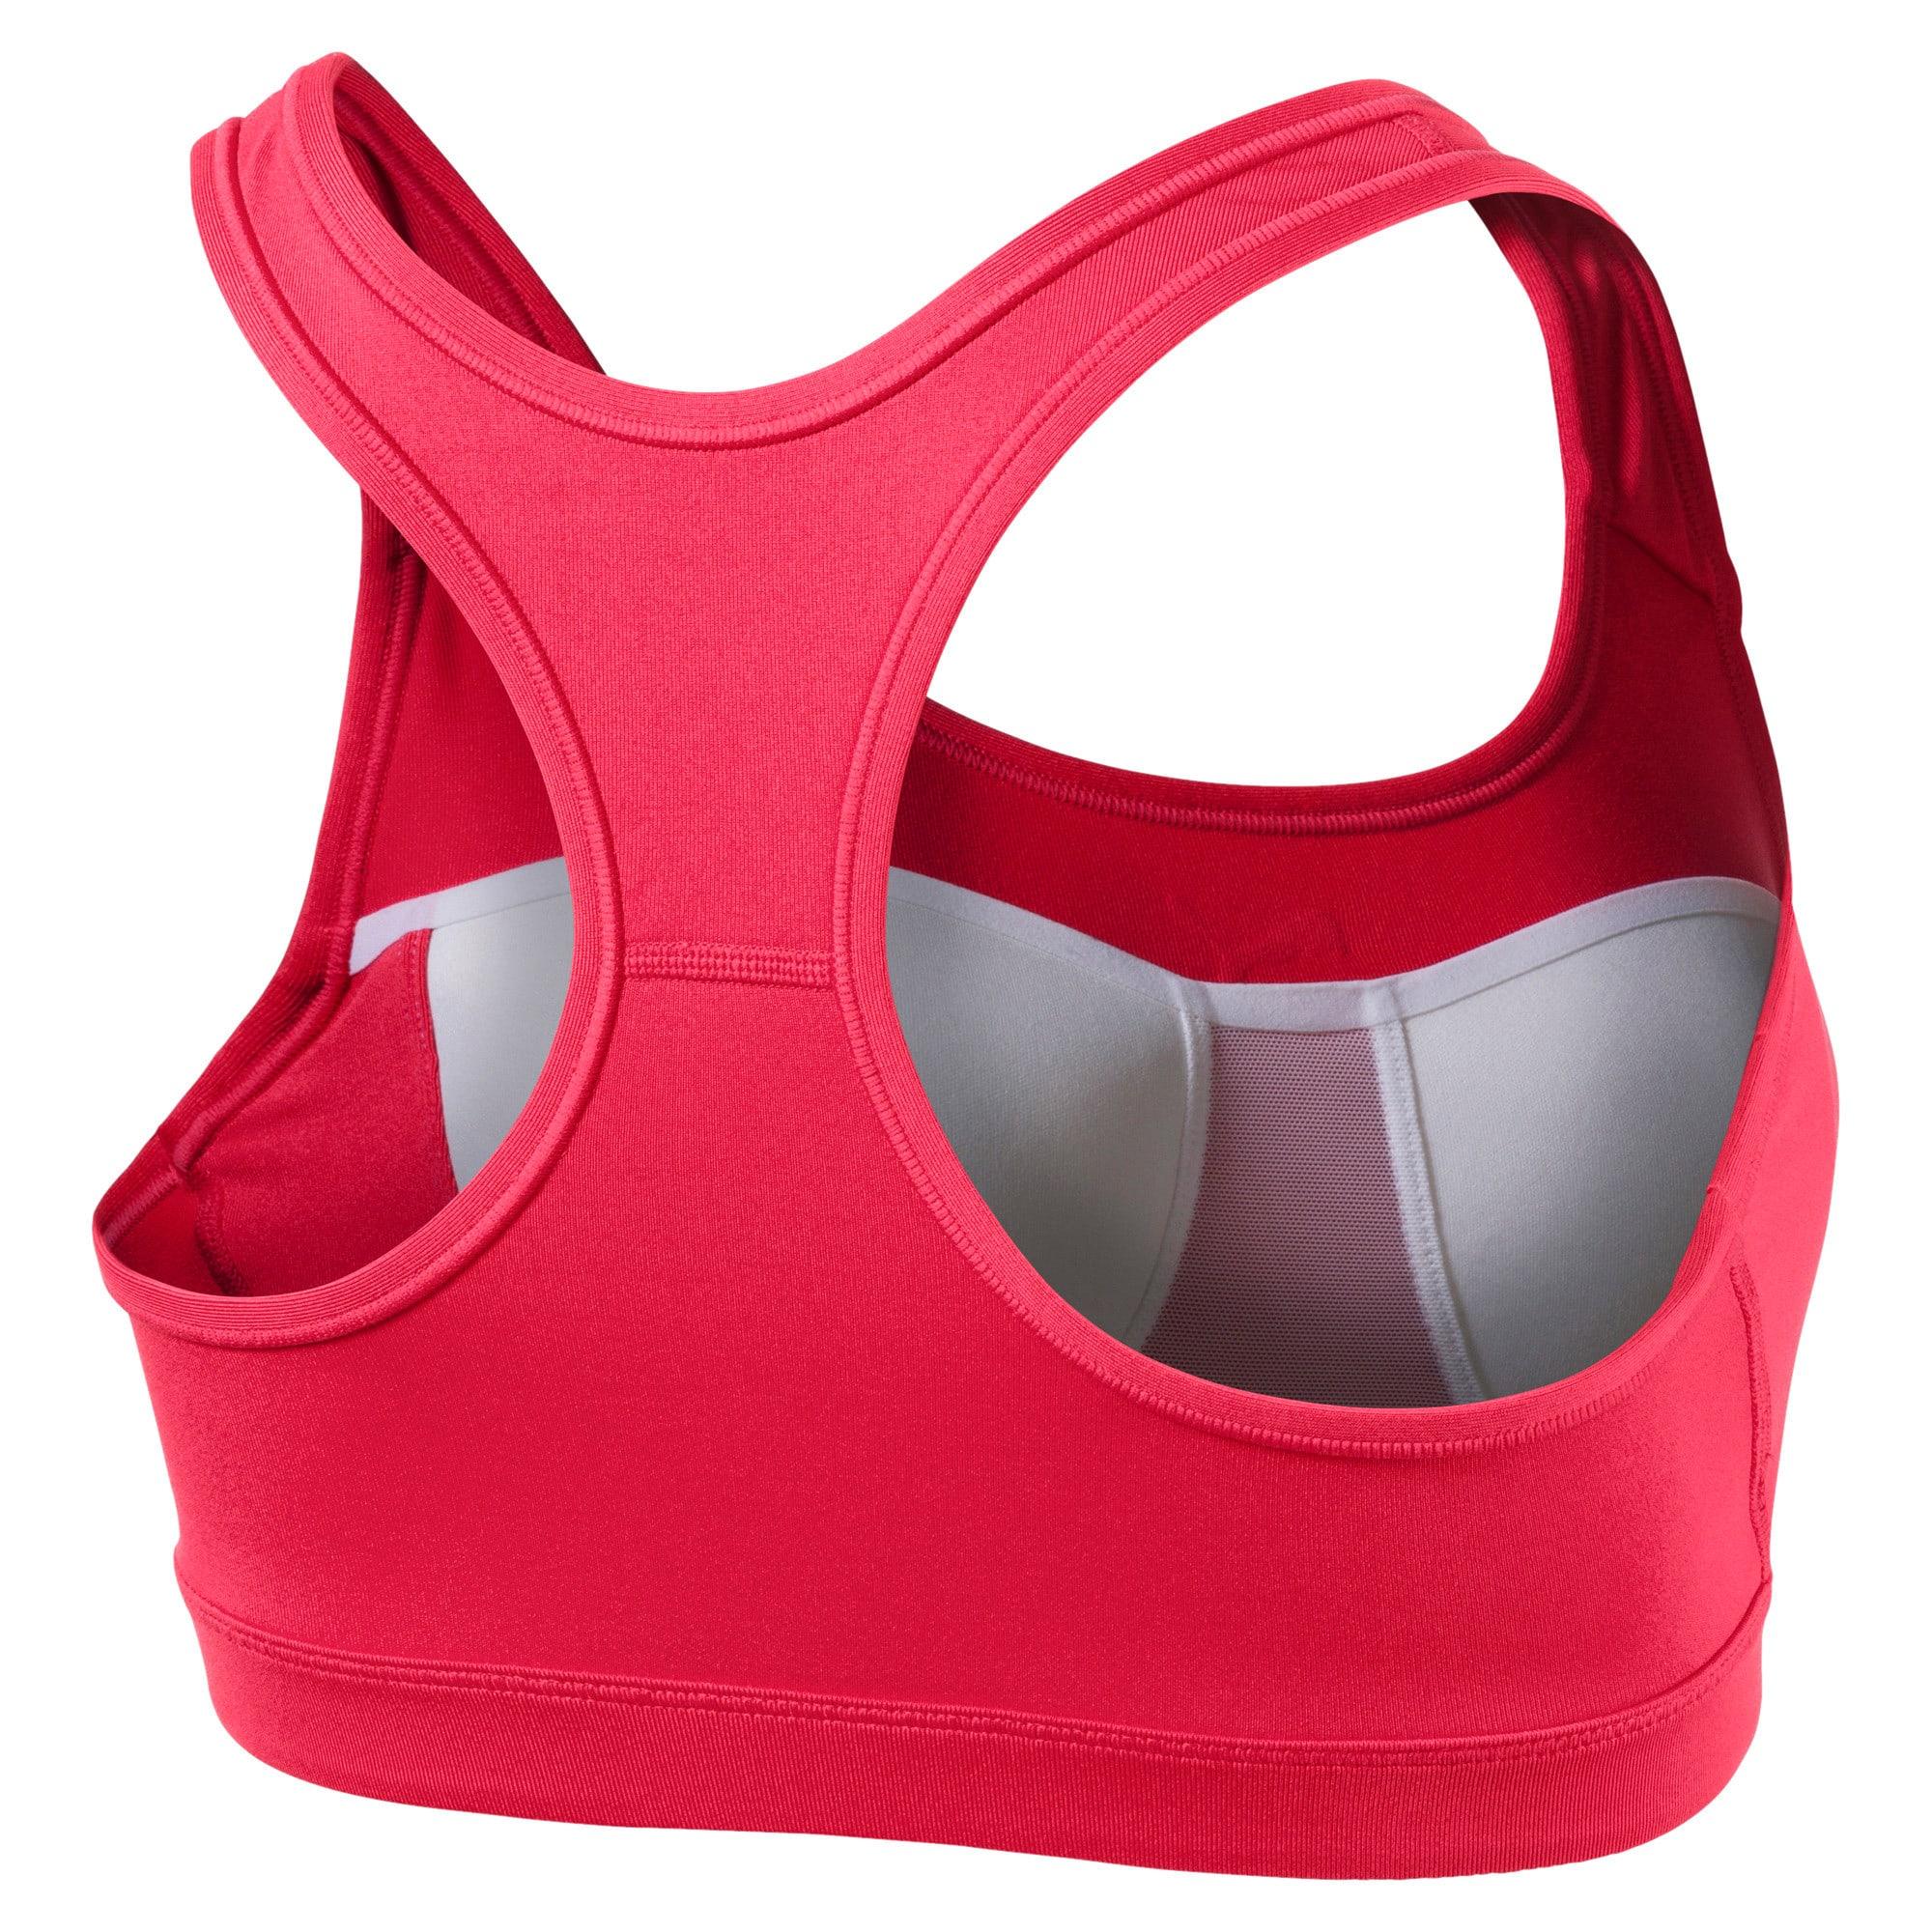 Thumbnail 2 of Training Women's PWRSHAPE Forever Padded Bra Top, Paradise Pink, medium-IND